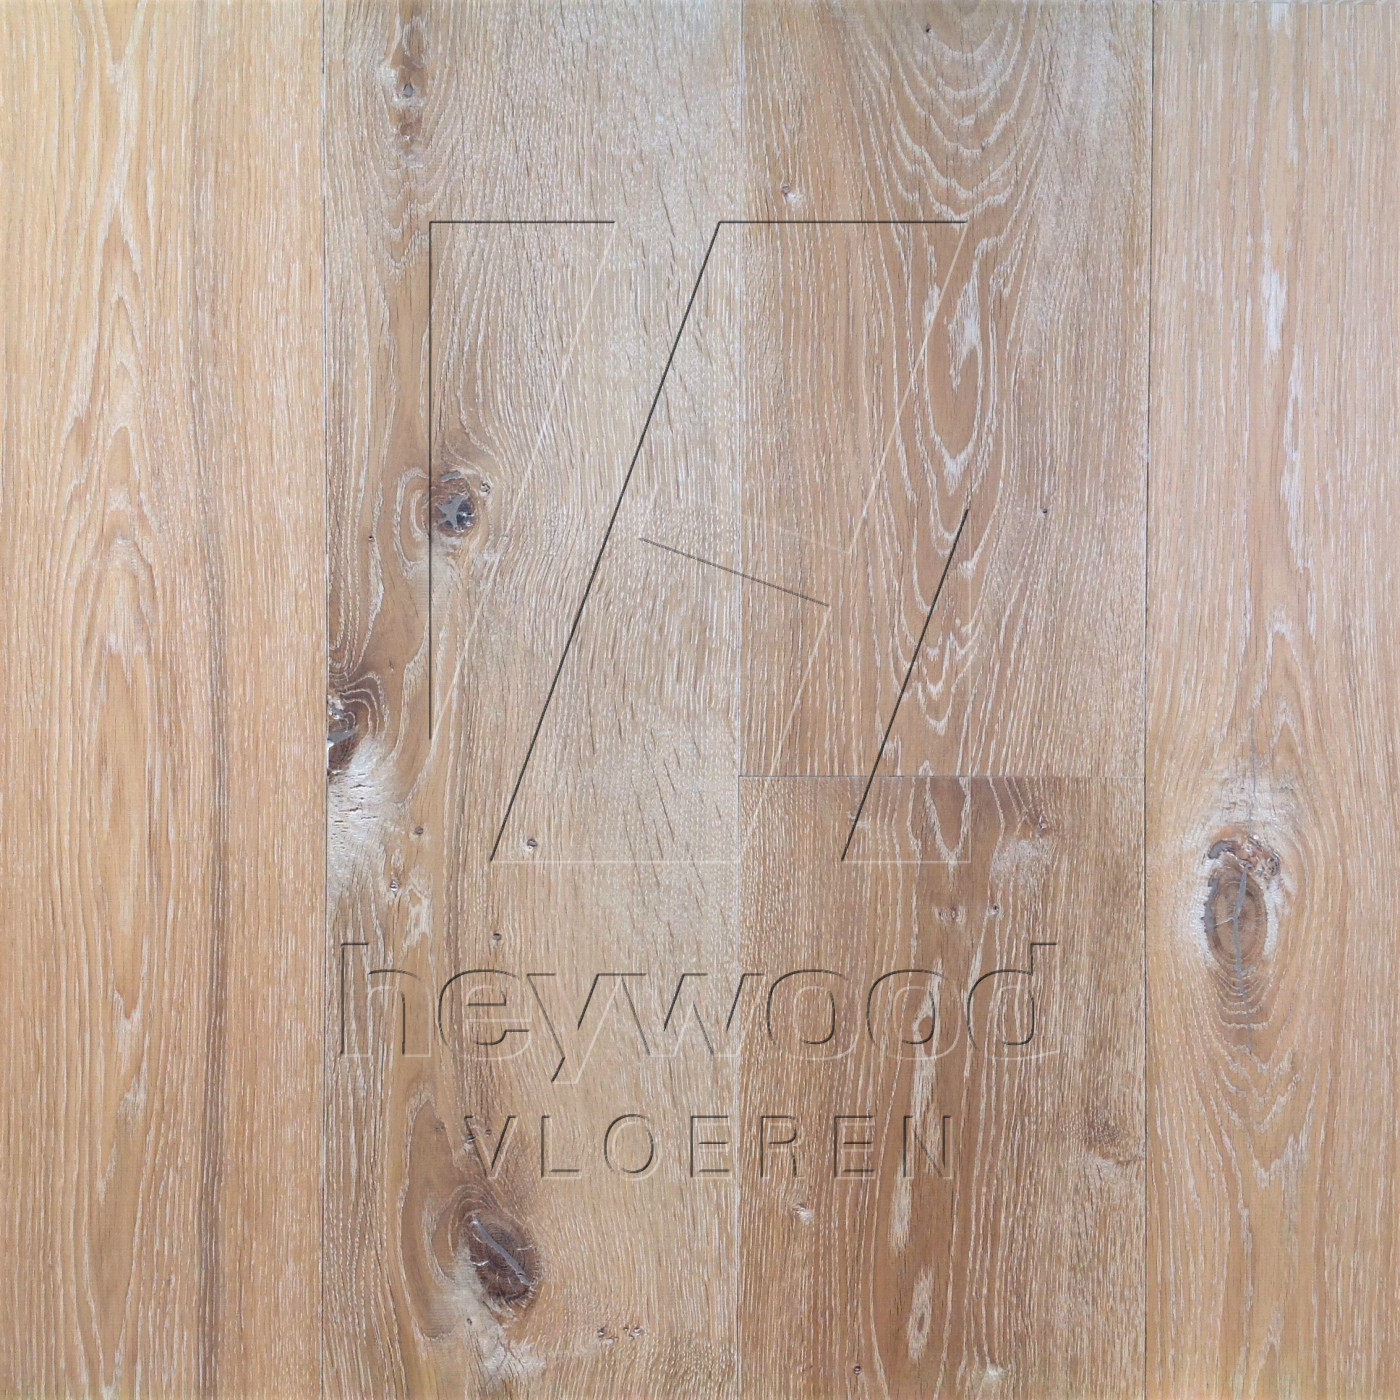 Plank Calgary in European Oak Character of Bespoke Wooden Floors